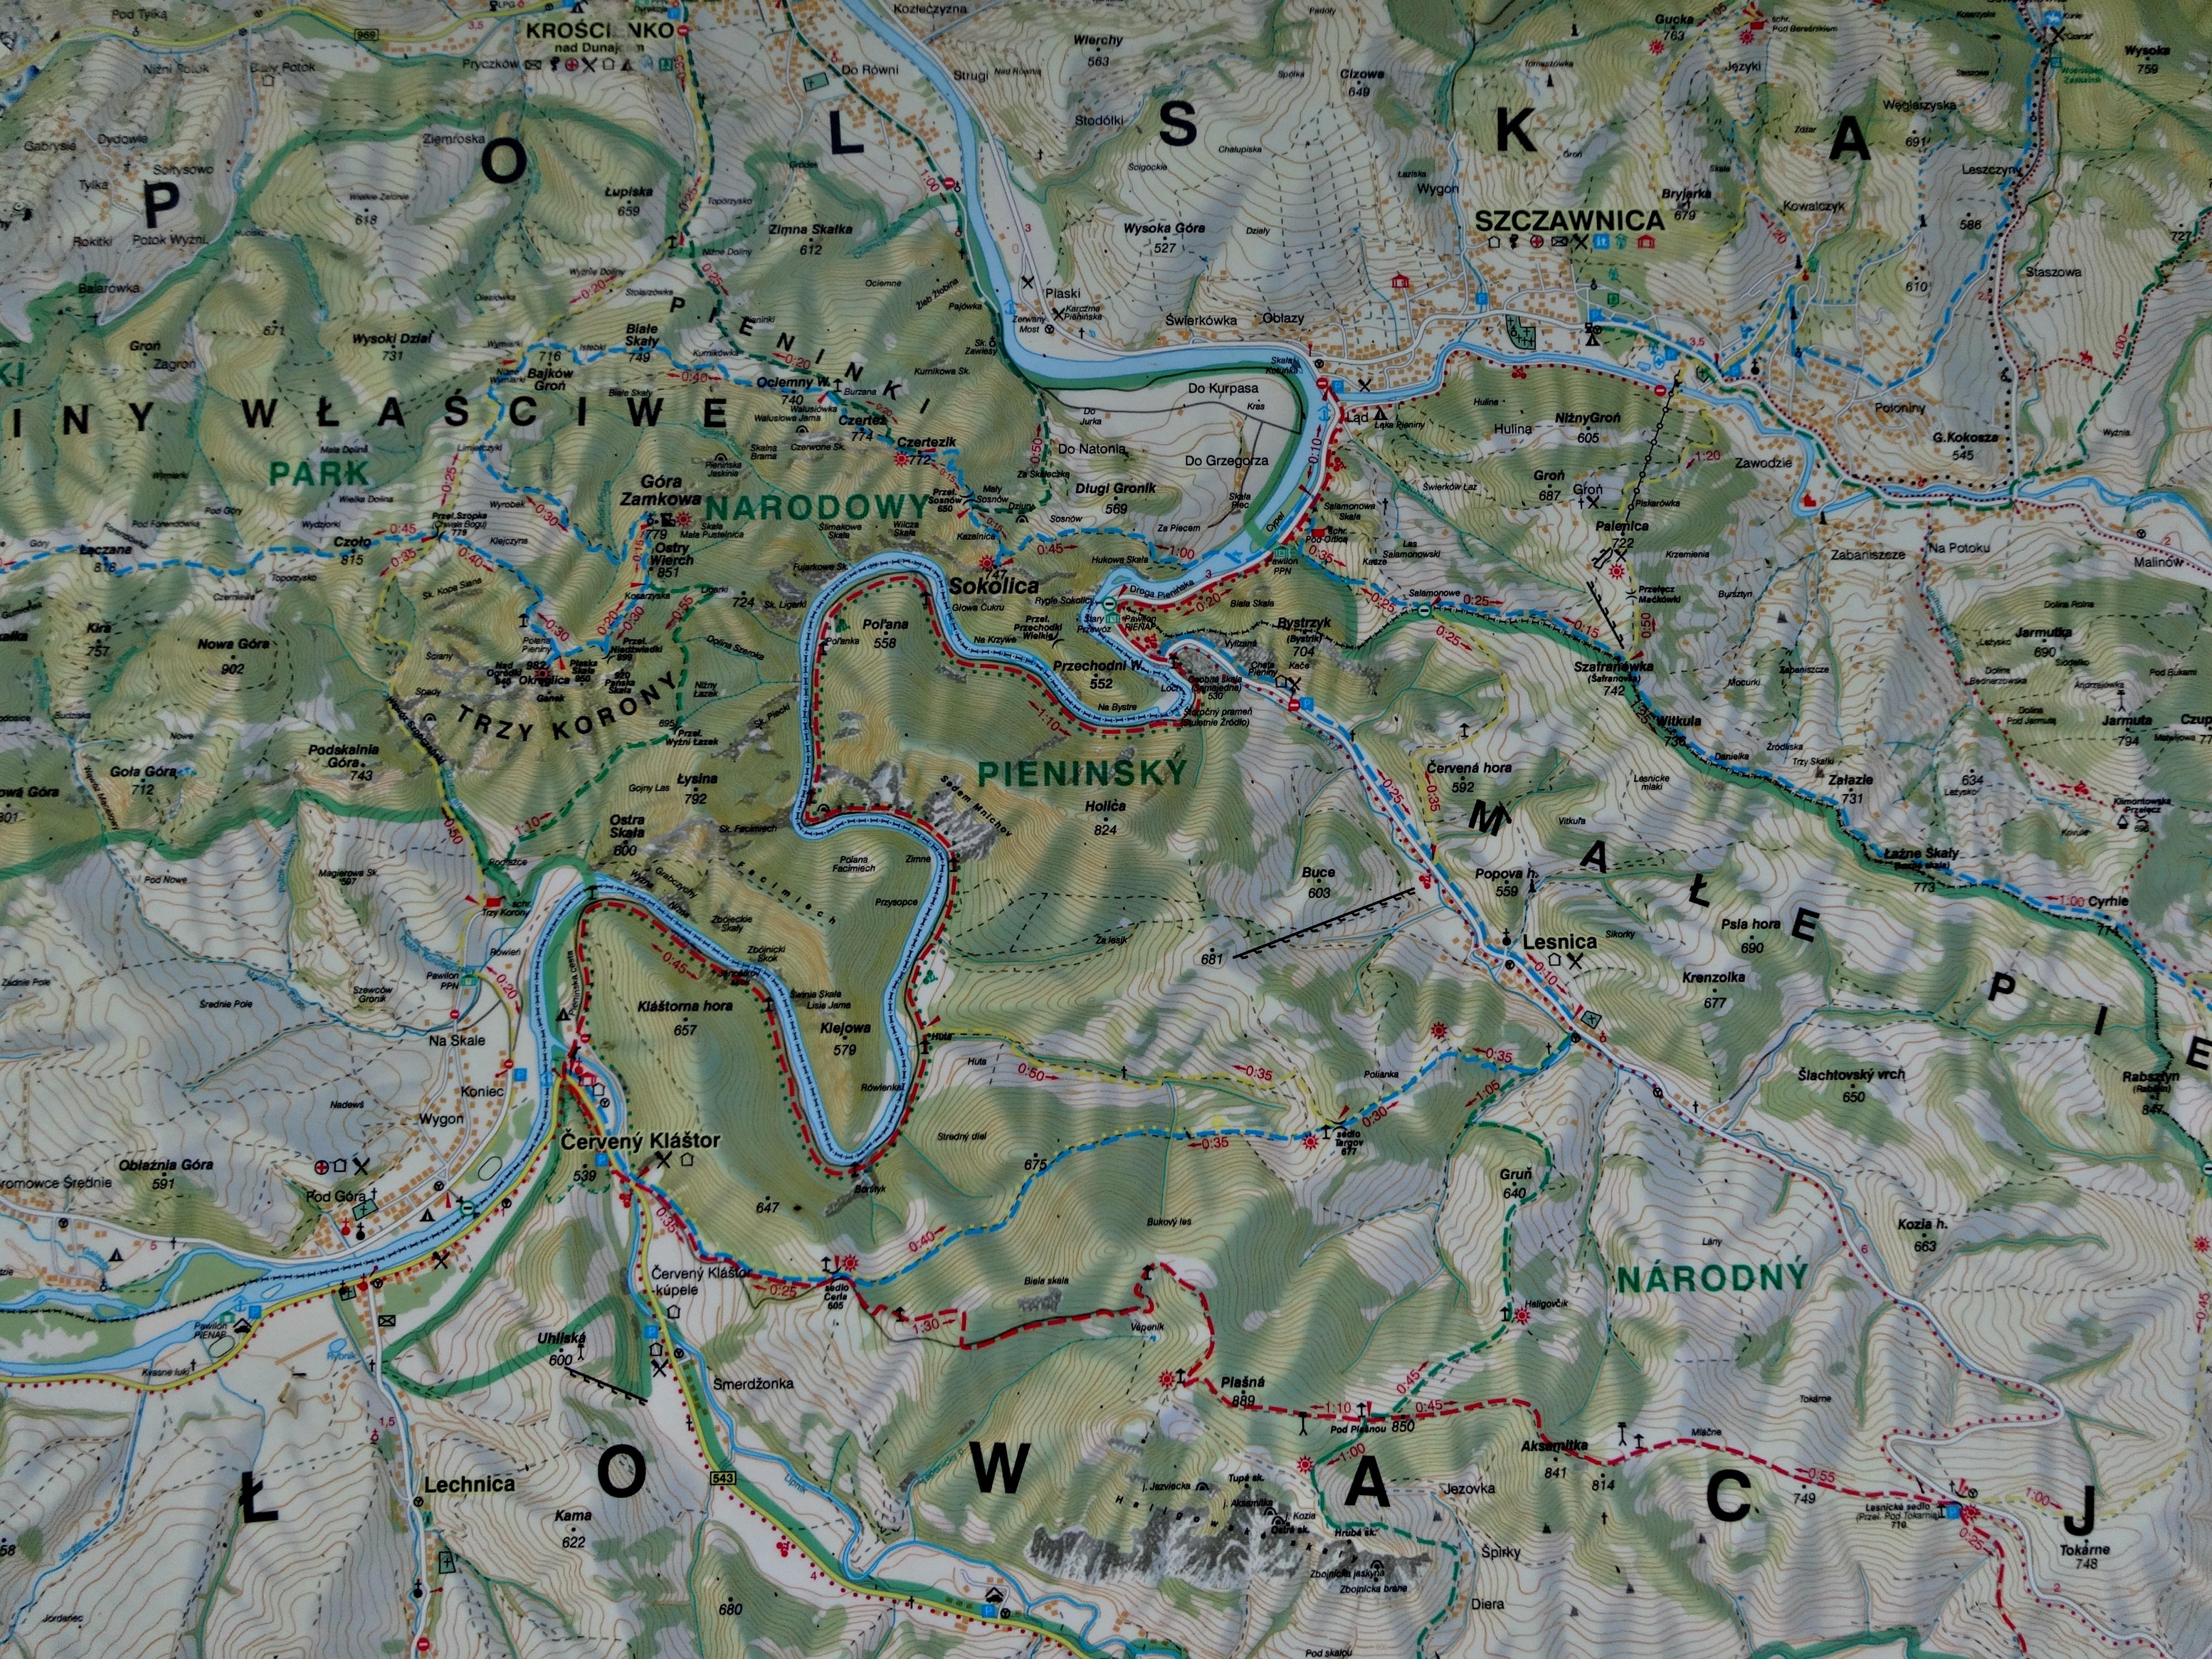 turstier kart Bildet : kart, Polen, turstier, Pieniny, flyfotografering  turstier kart